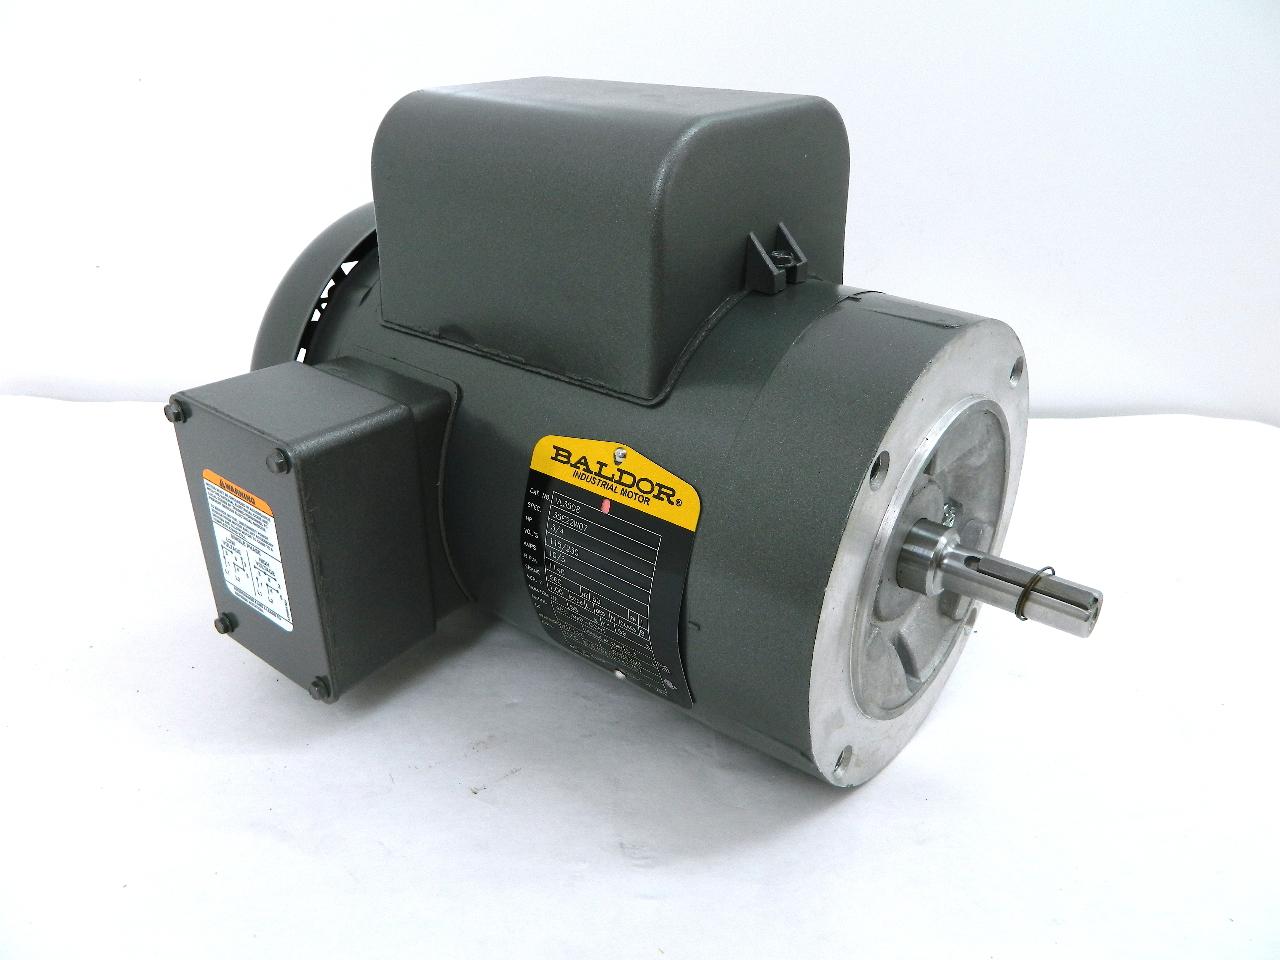 Baldor Vl3508 Electric Motor Hp 56c Frame 1140 Rpm Tefc 115 230vac 1 Ph Ebay